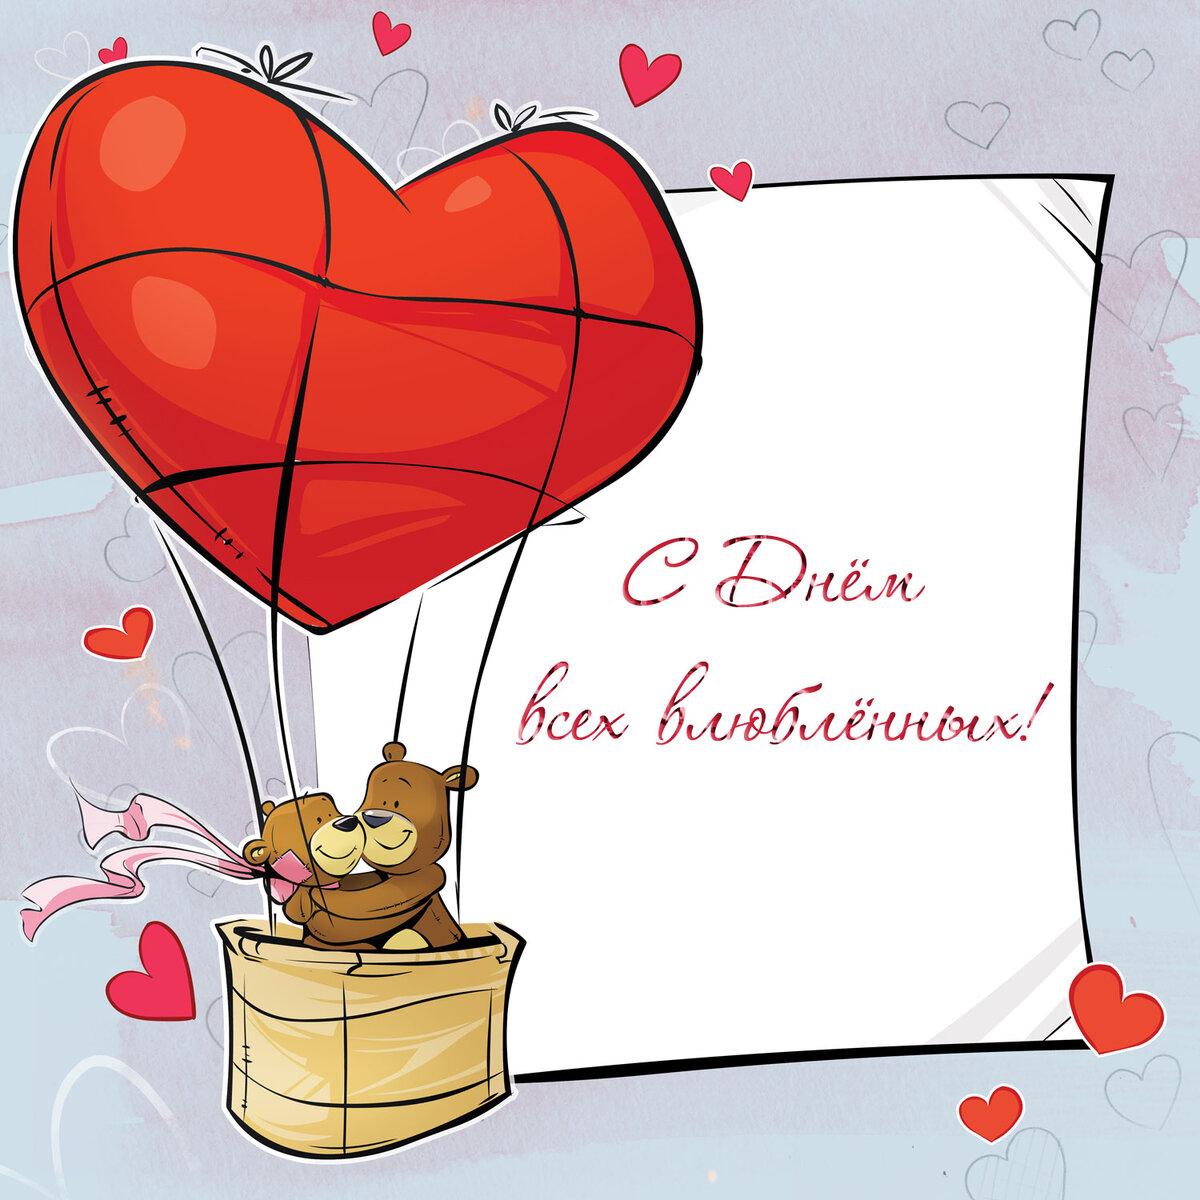 Пожелания на 14 февраля для любимого